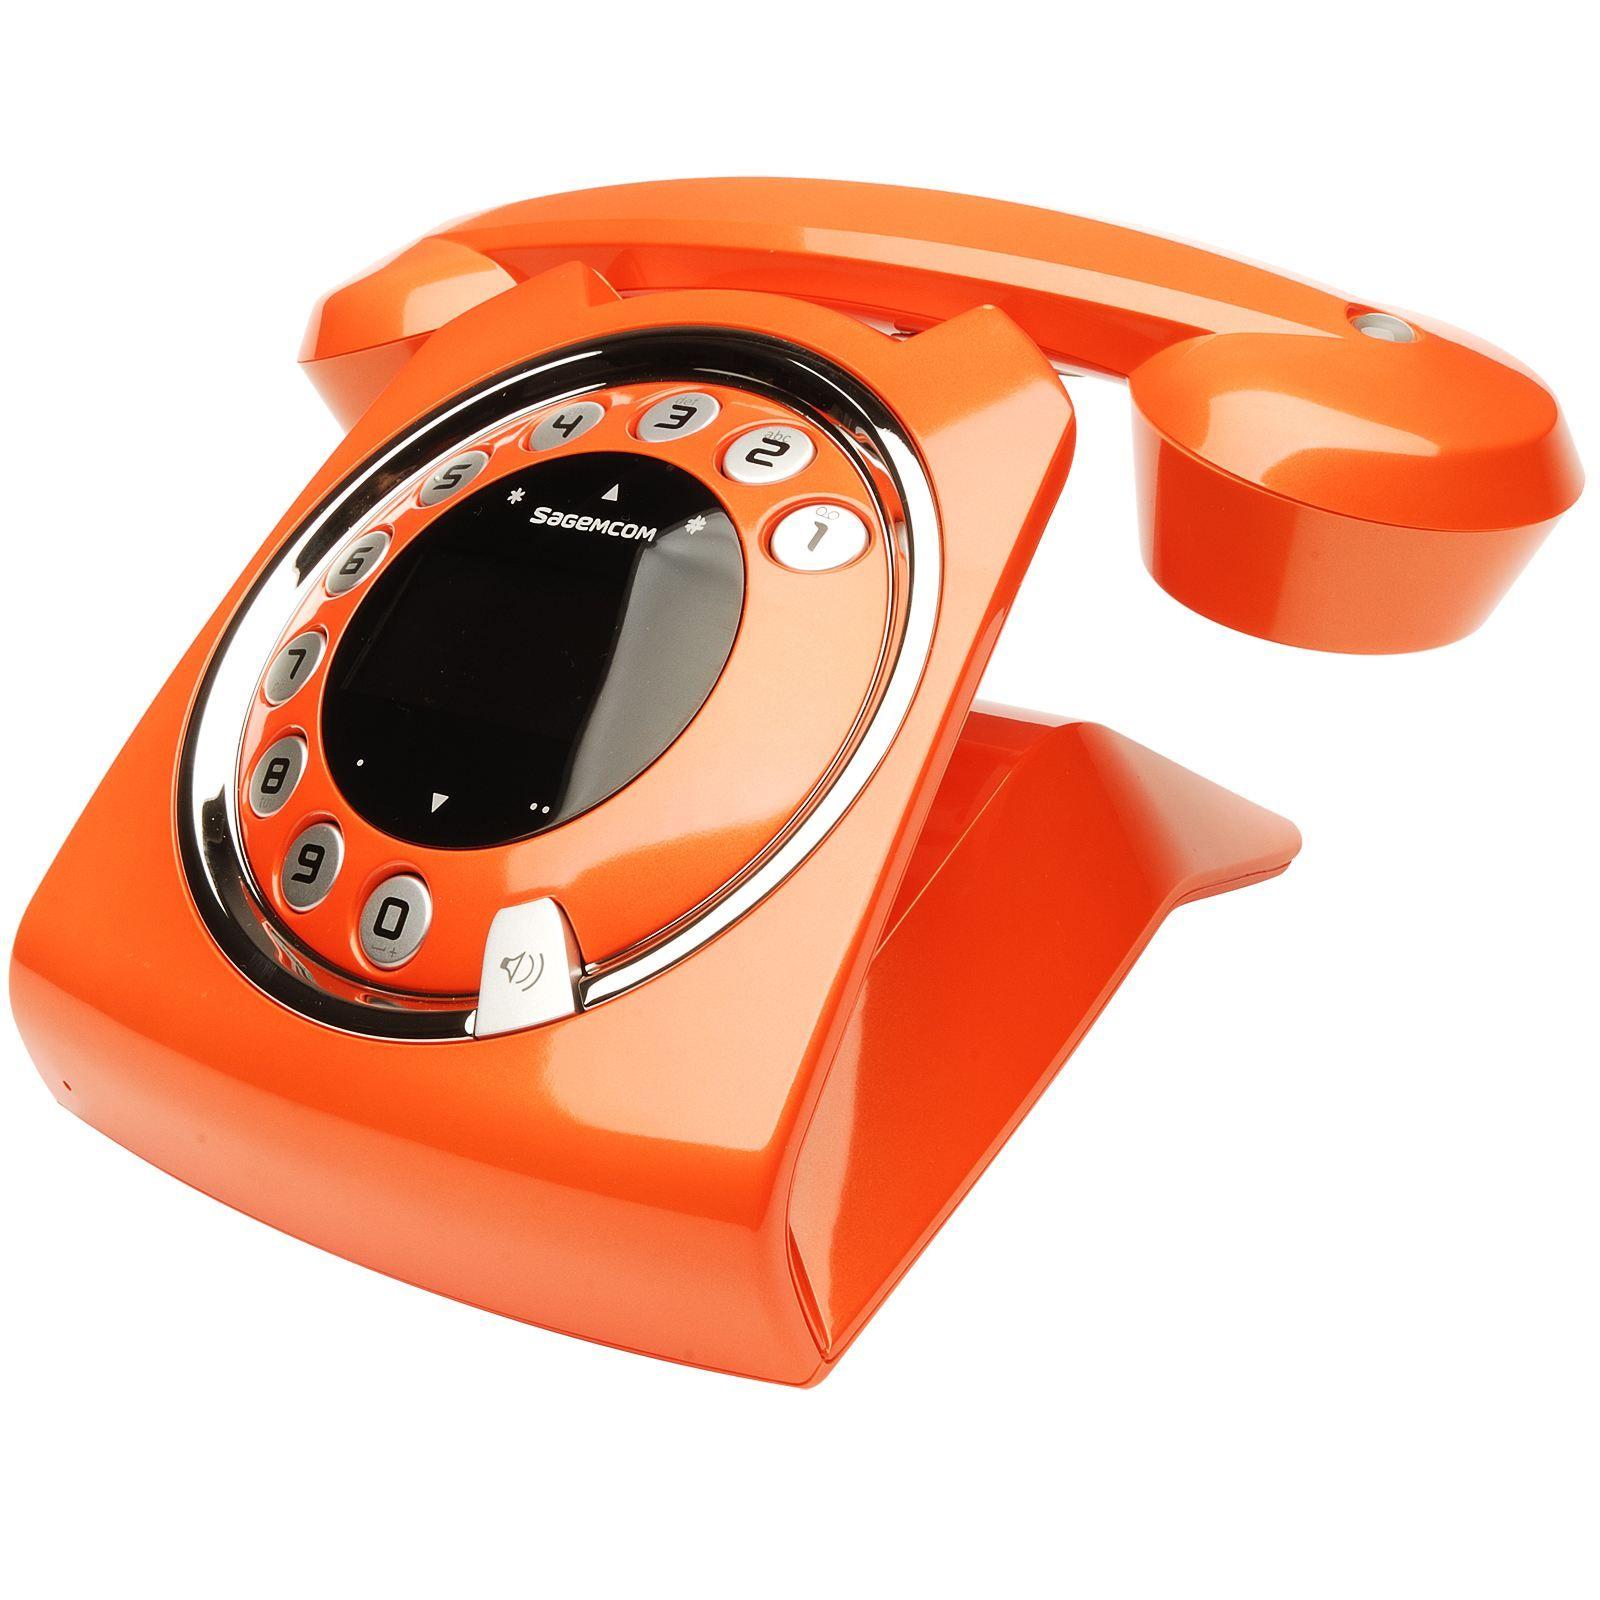 sagemcom sixty vintage style cordless phone in orange orange pinterest. Black Bedroom Furniture Sets. Home Design Ideas